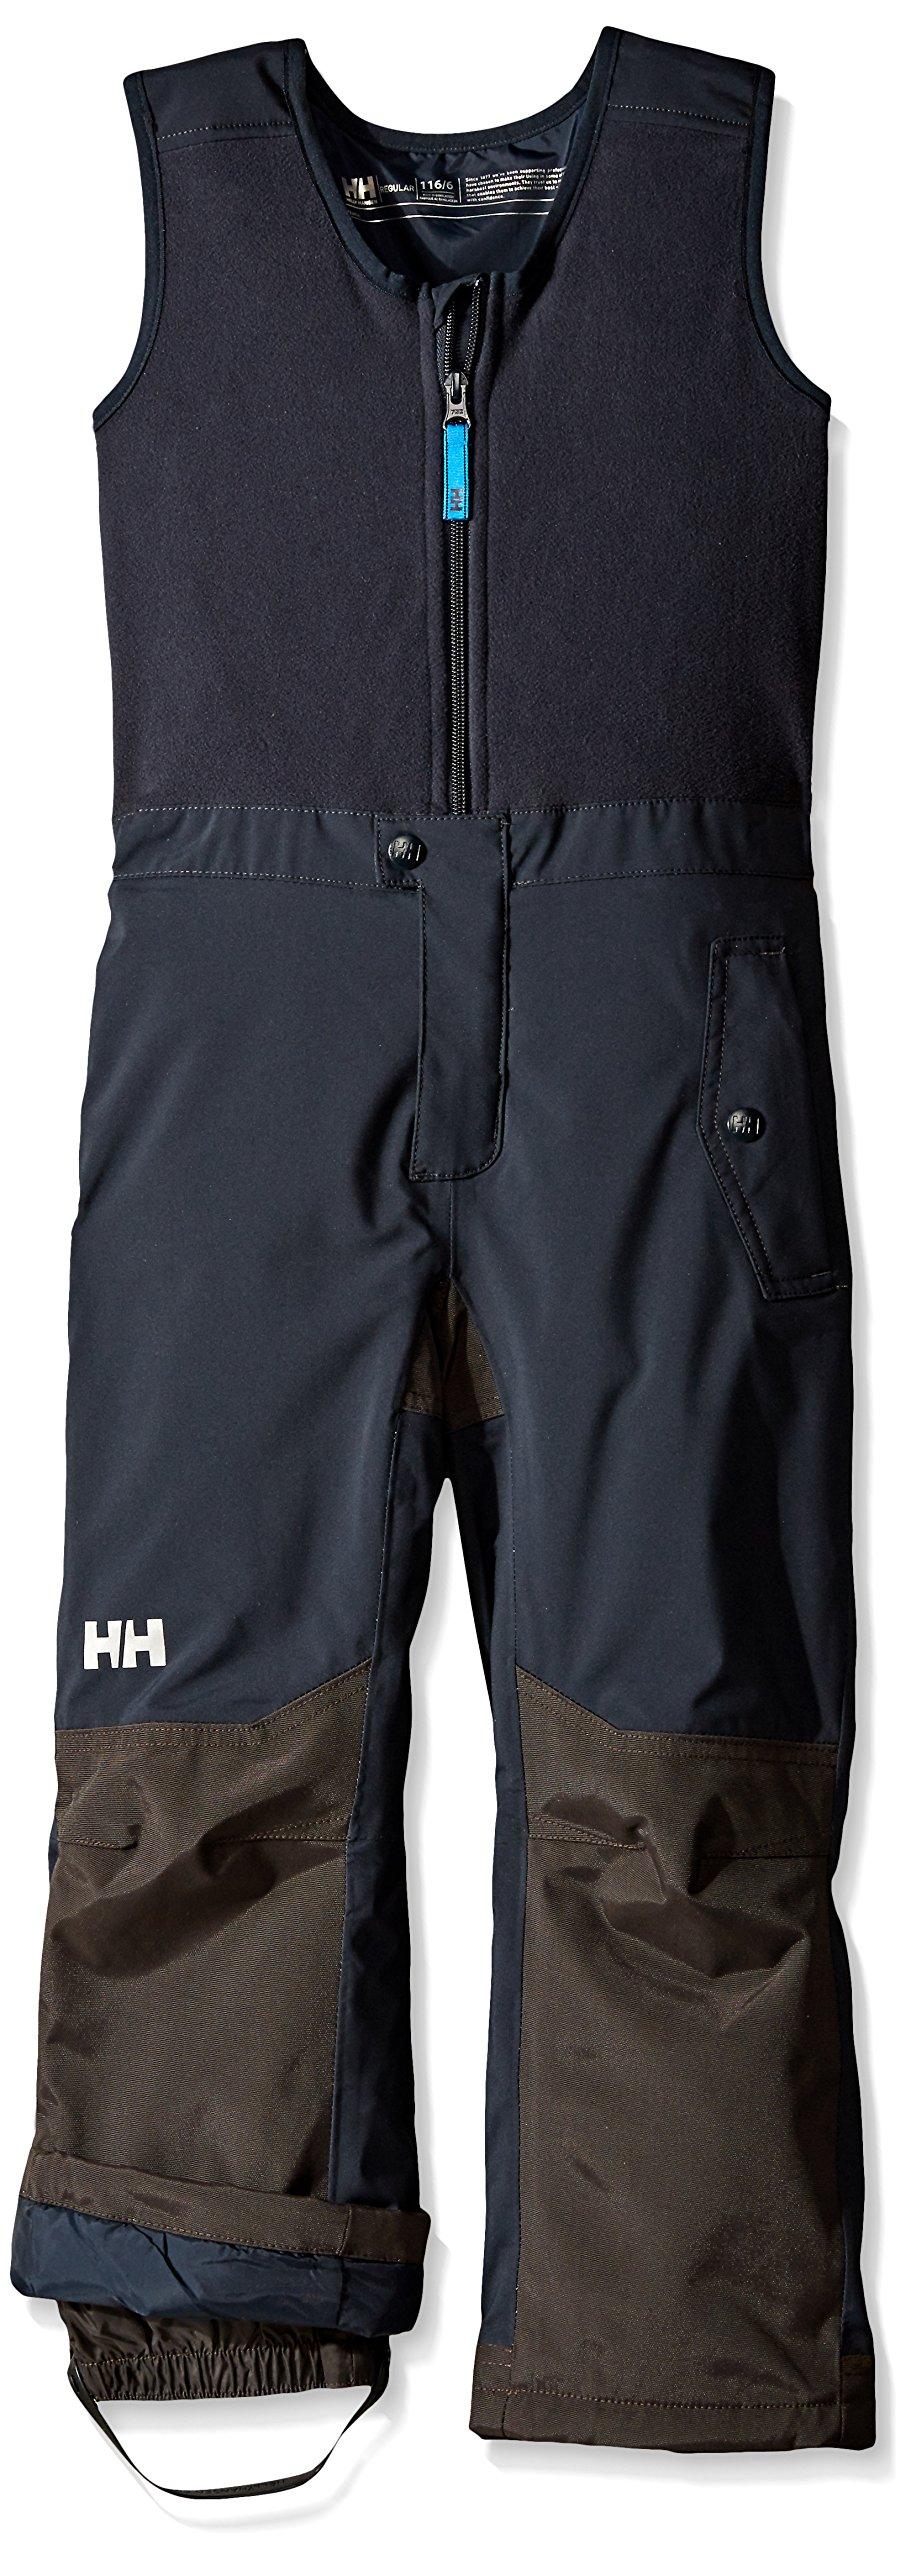 Helly Hansen Kids Powder Bib Pants, Navy, 1